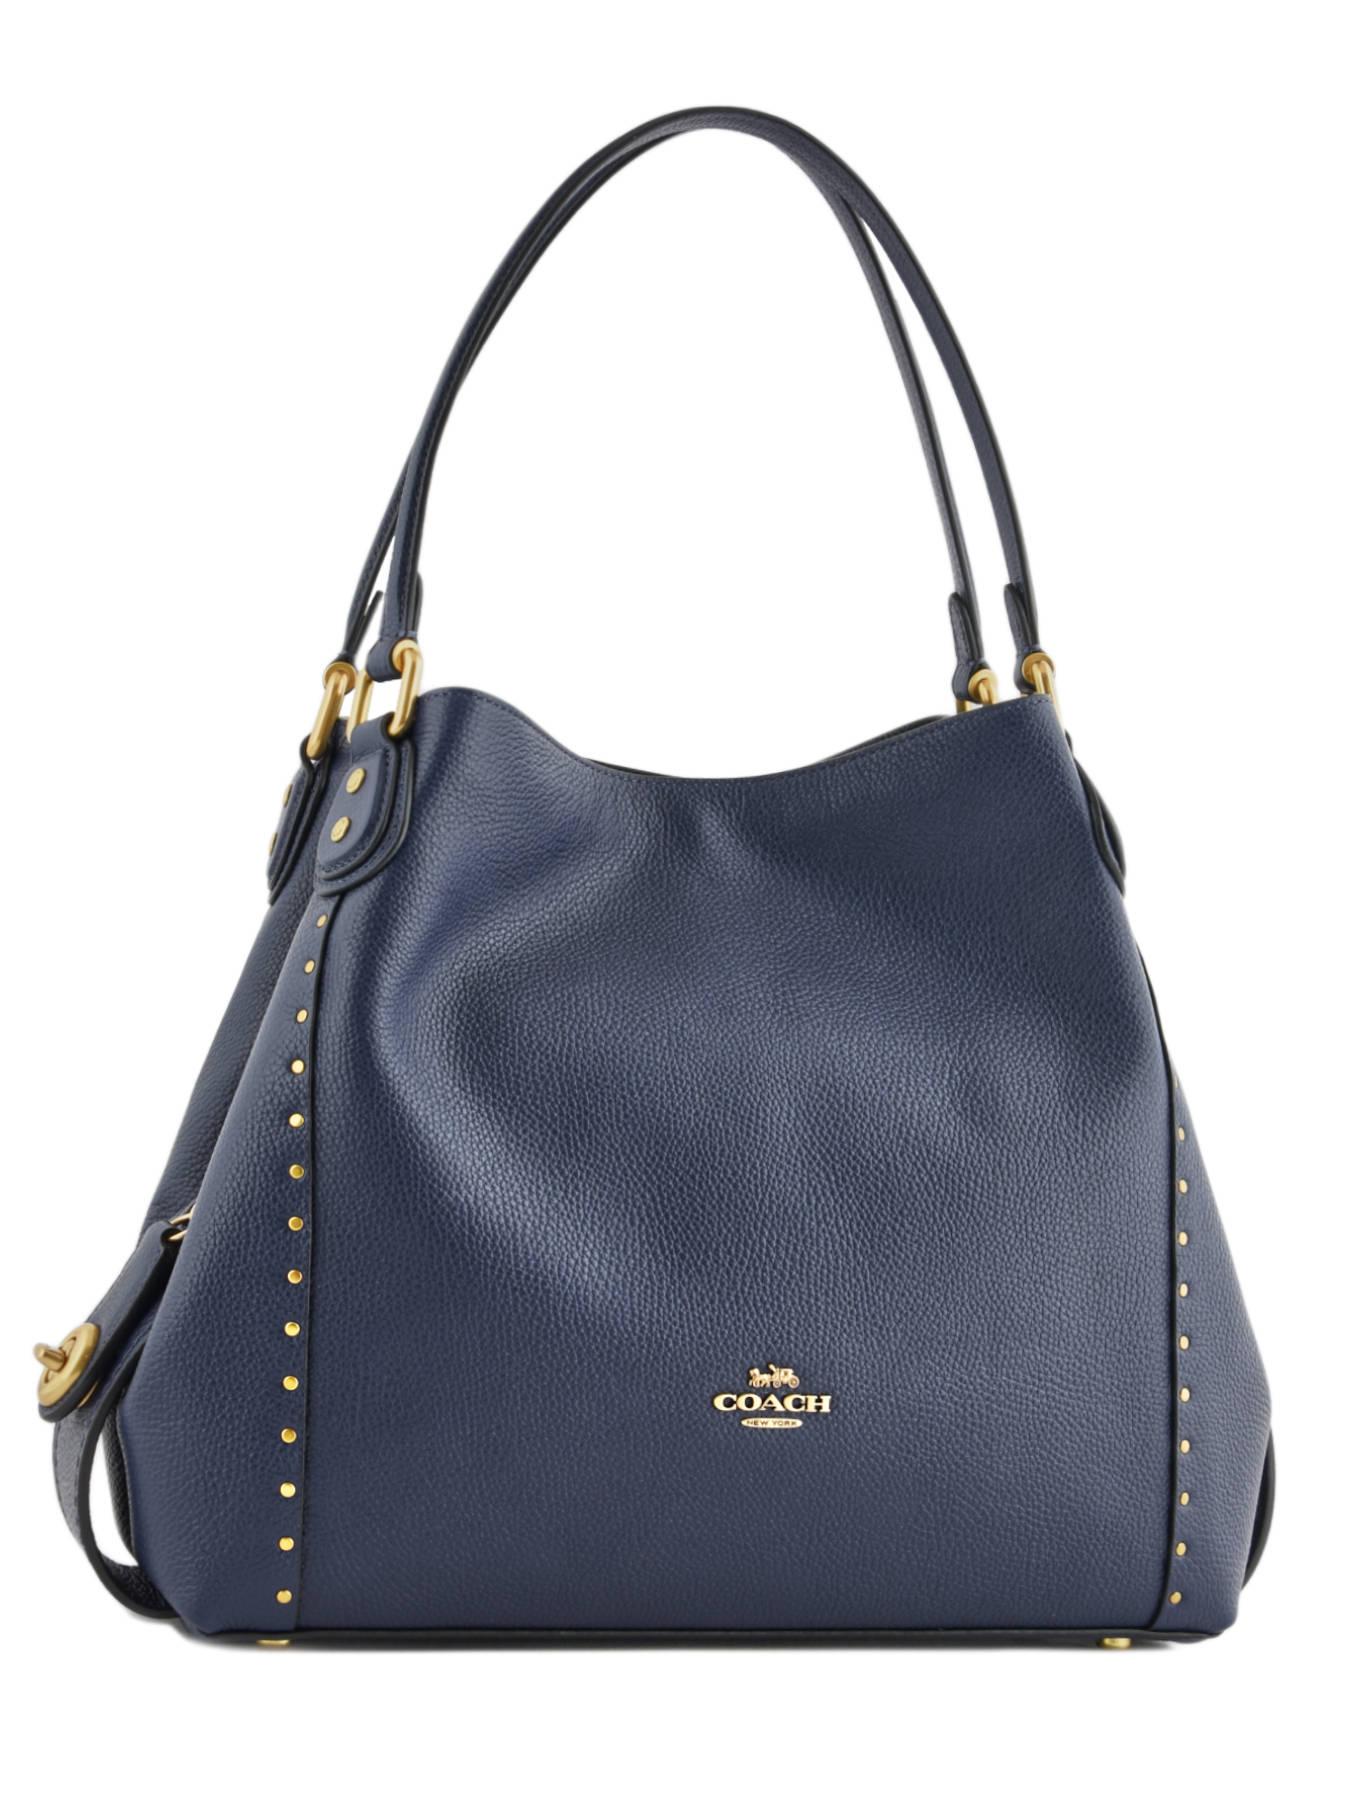 ... Edie 31 Leather Shoulder Bag Coach Blue edie 38720 ... 8df7da96d078b